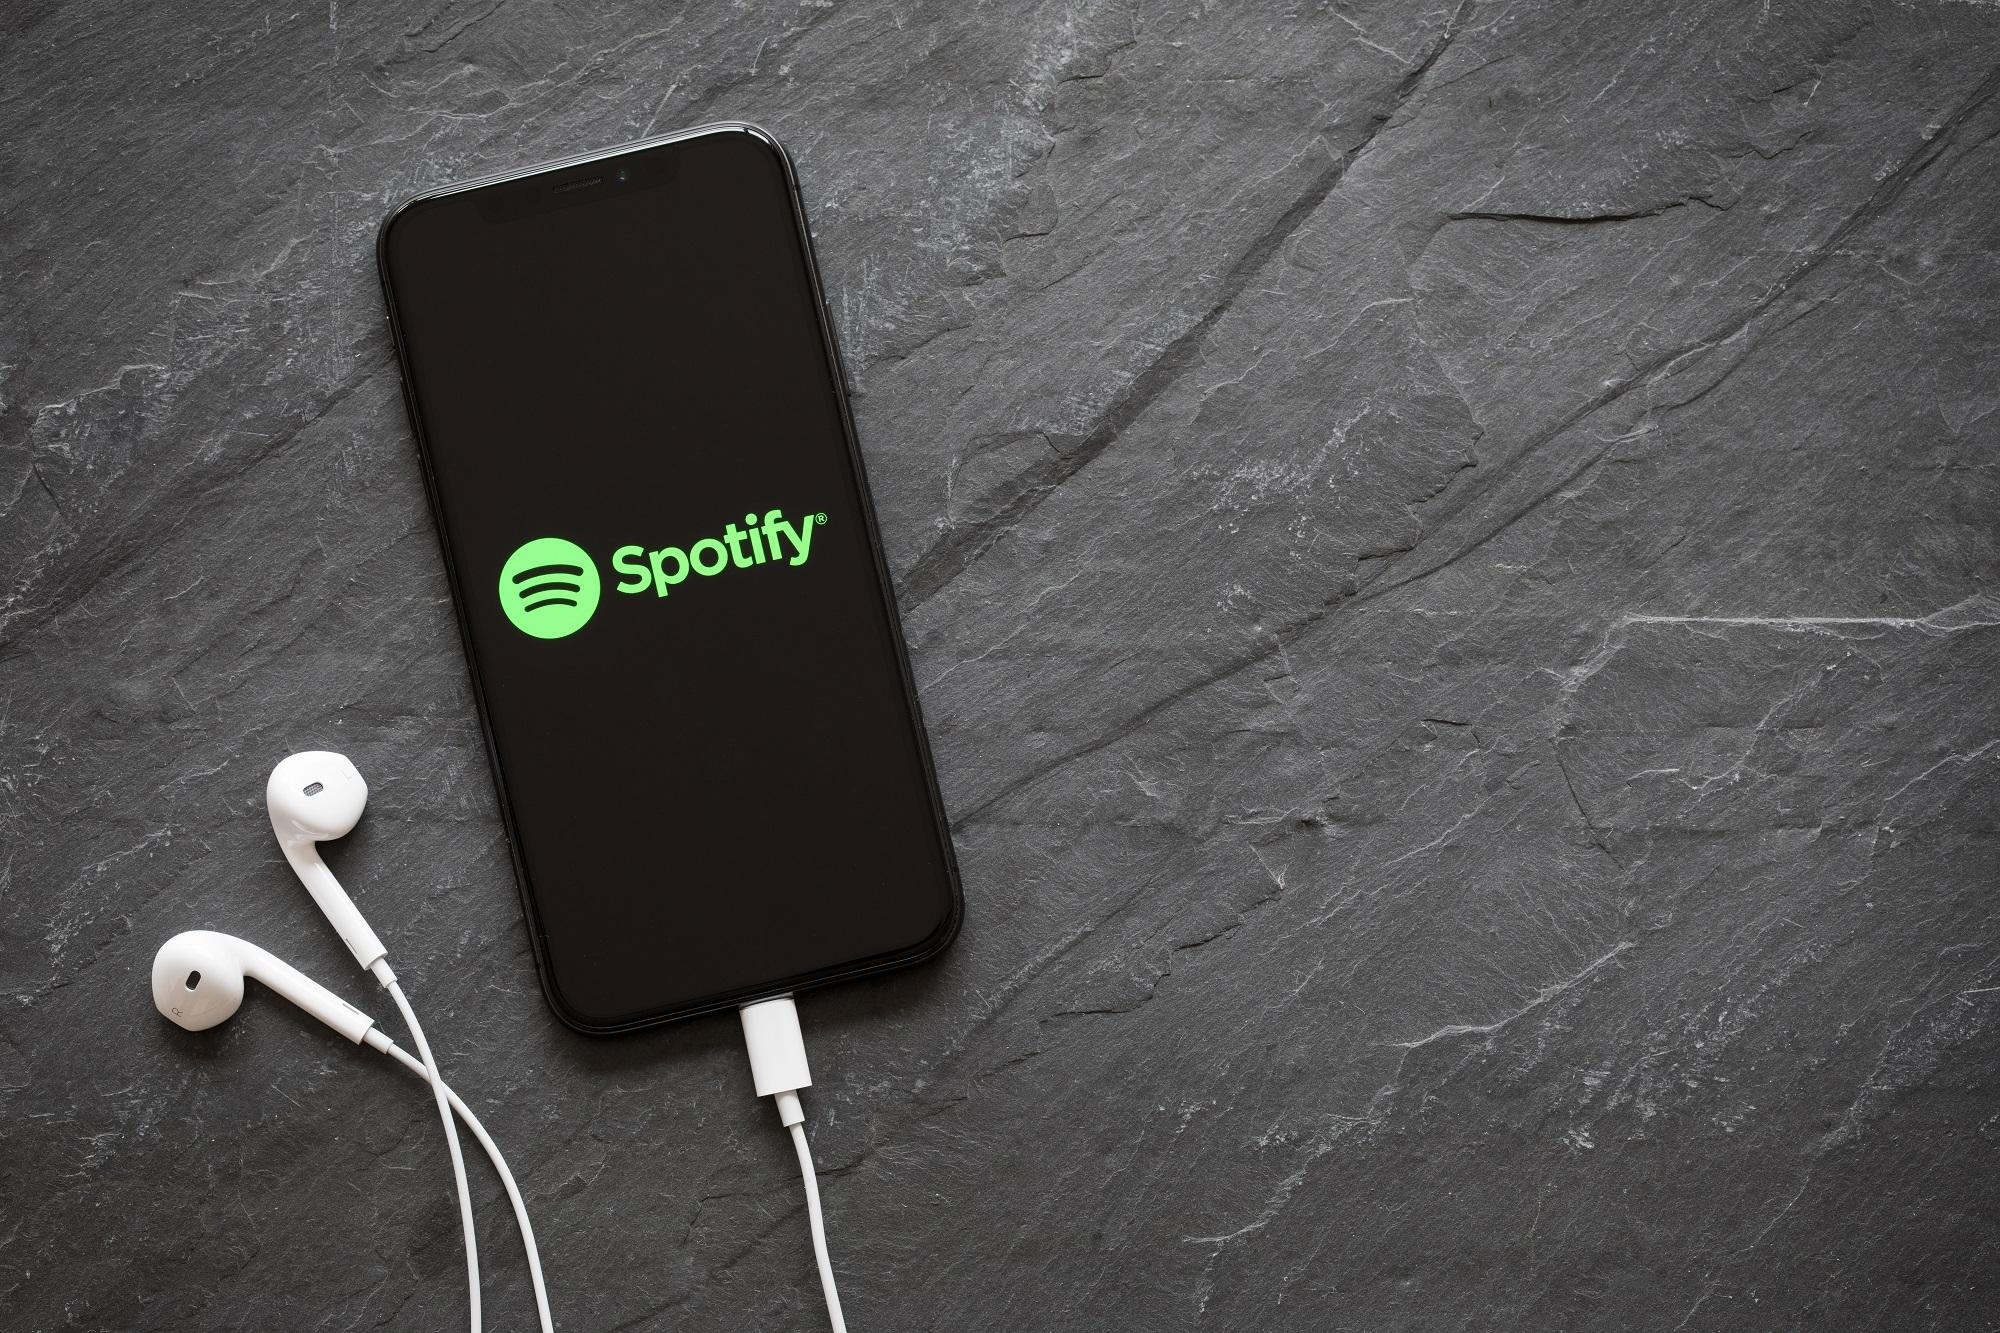 uploads///Spotify